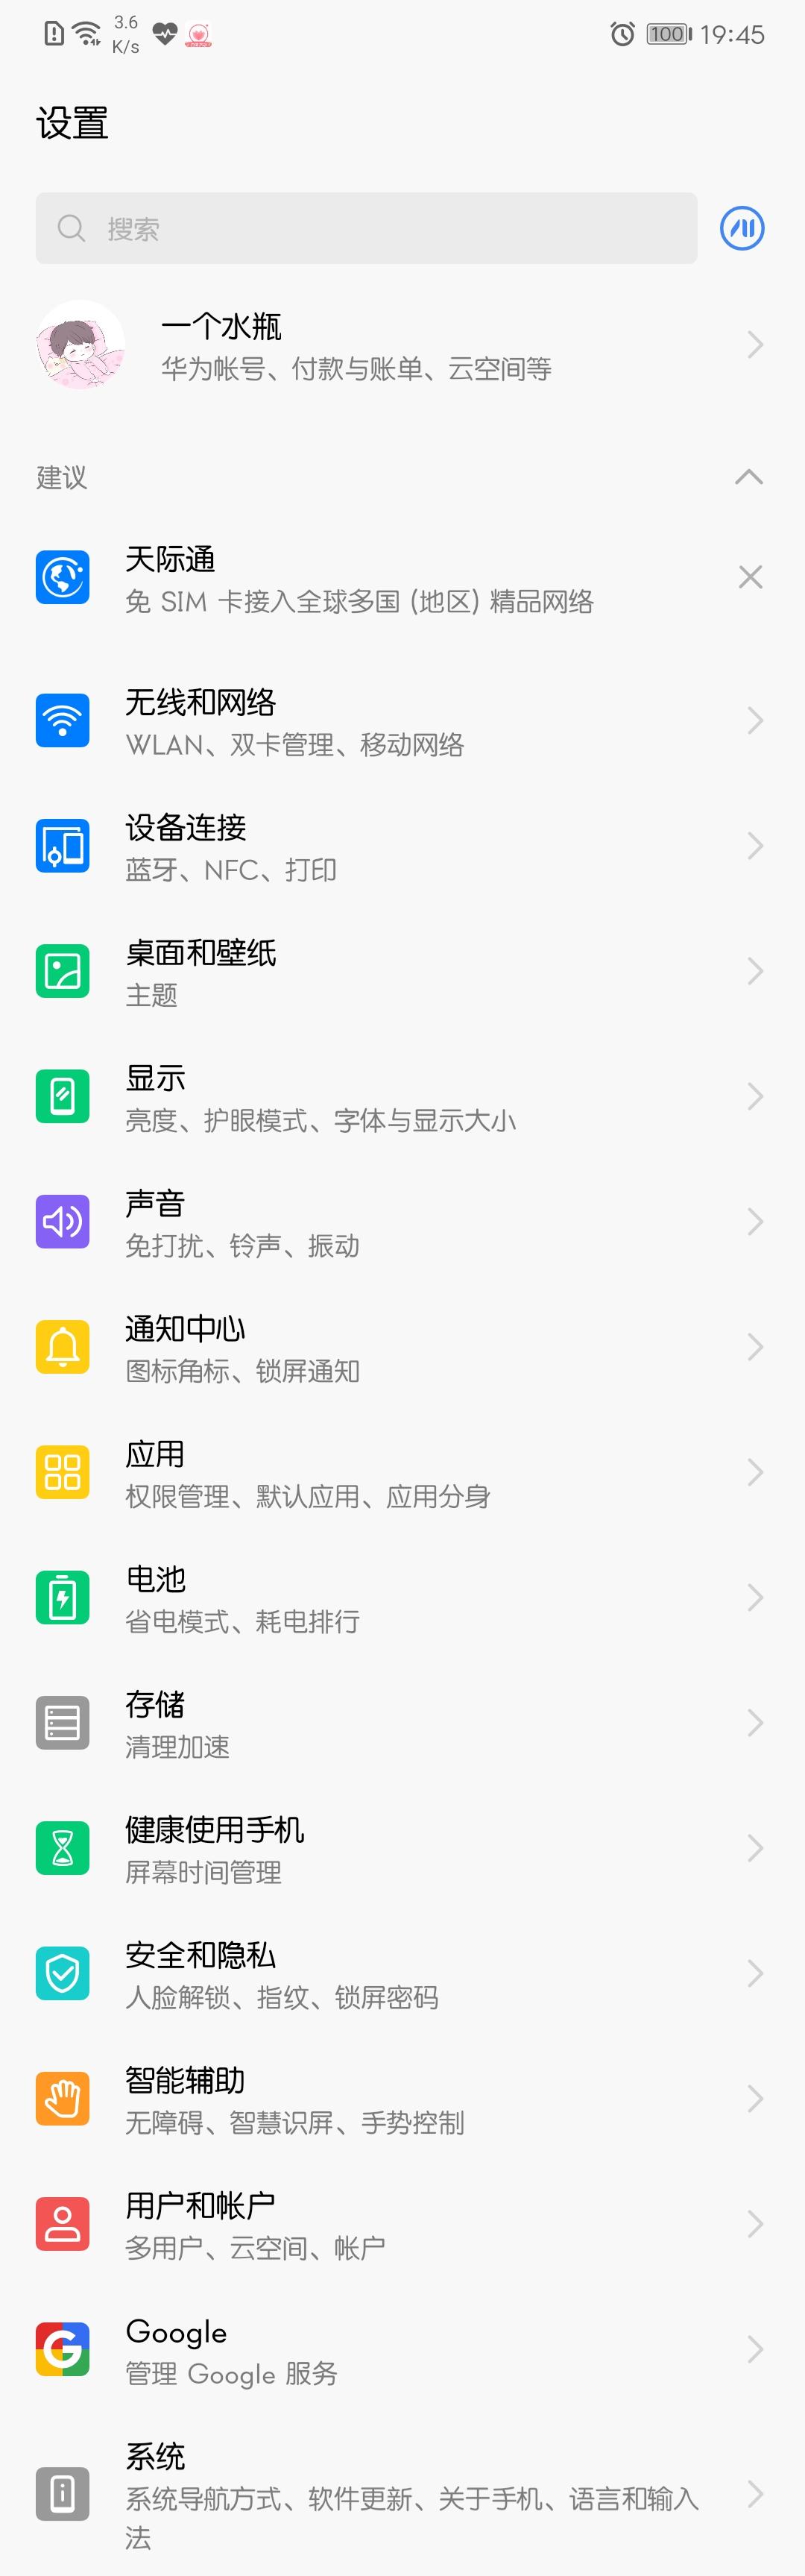 Screenshot_20190618_194534_com.android.settings.jpg